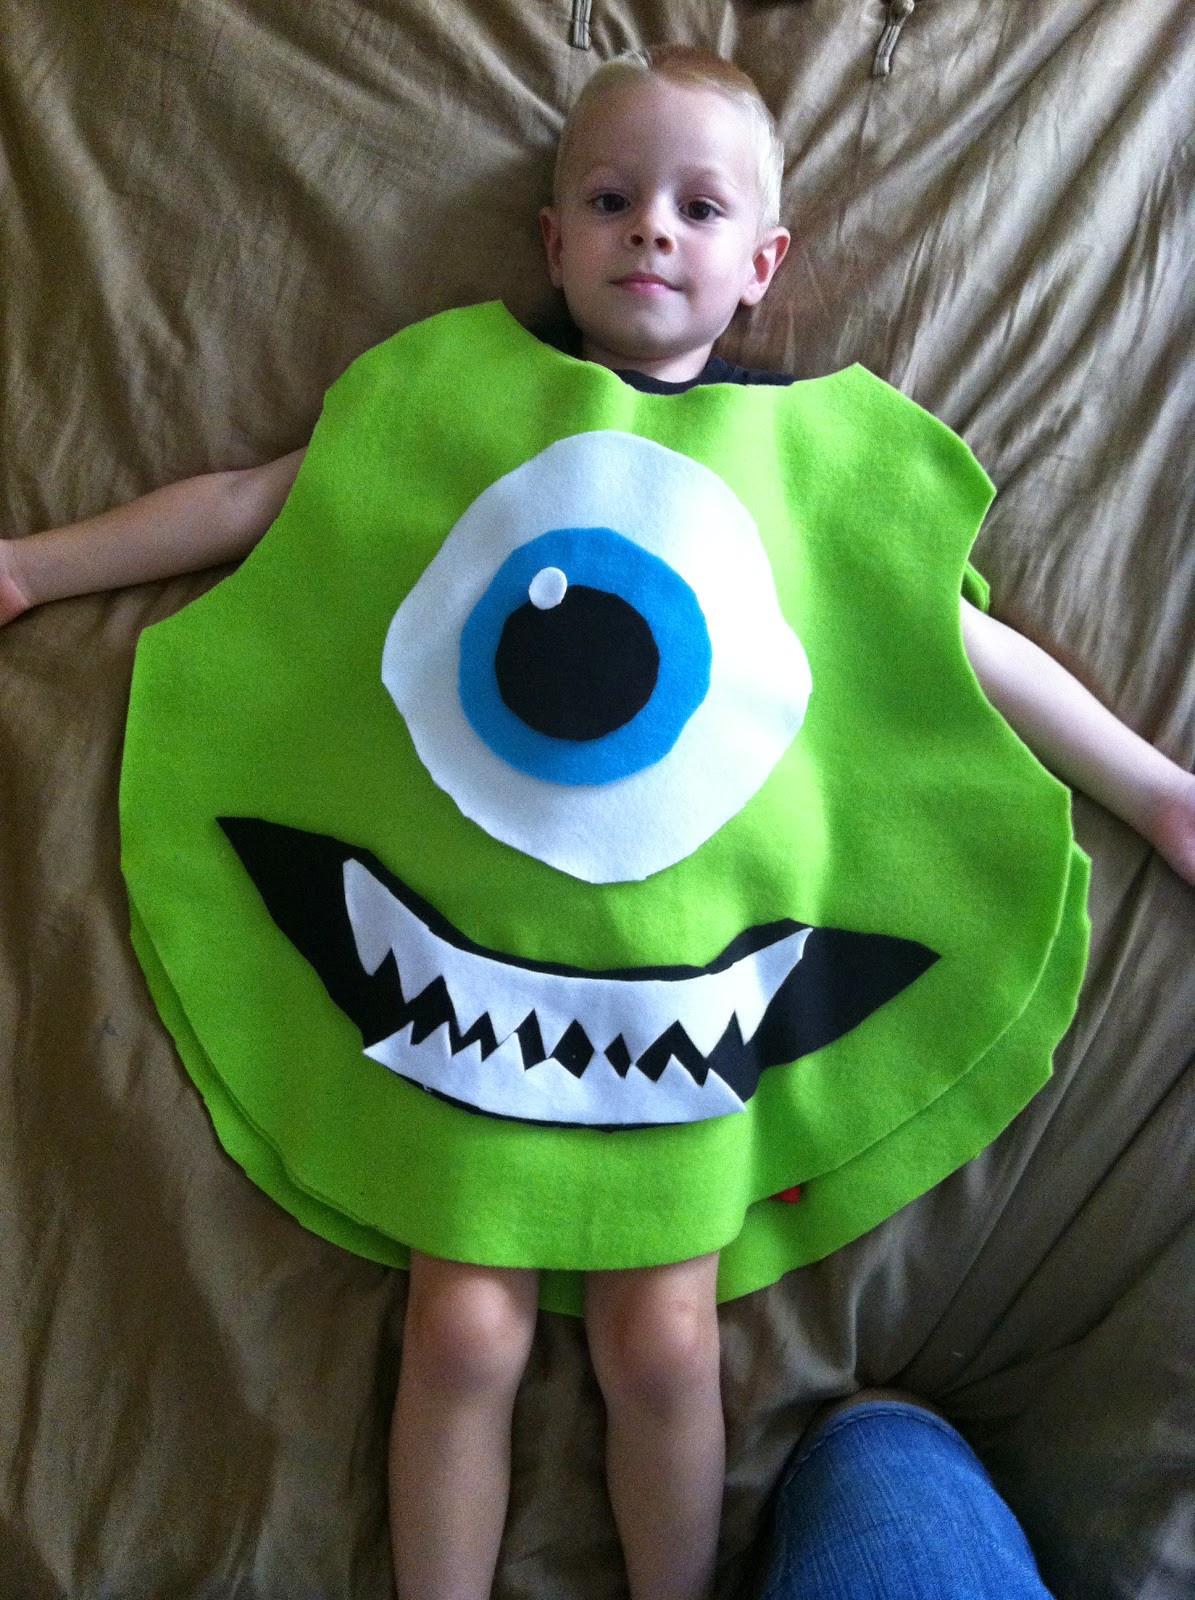 DIY Monsters Inc Costume  Chadwicks Picture Place Homemade Mike Wazowski Halloween